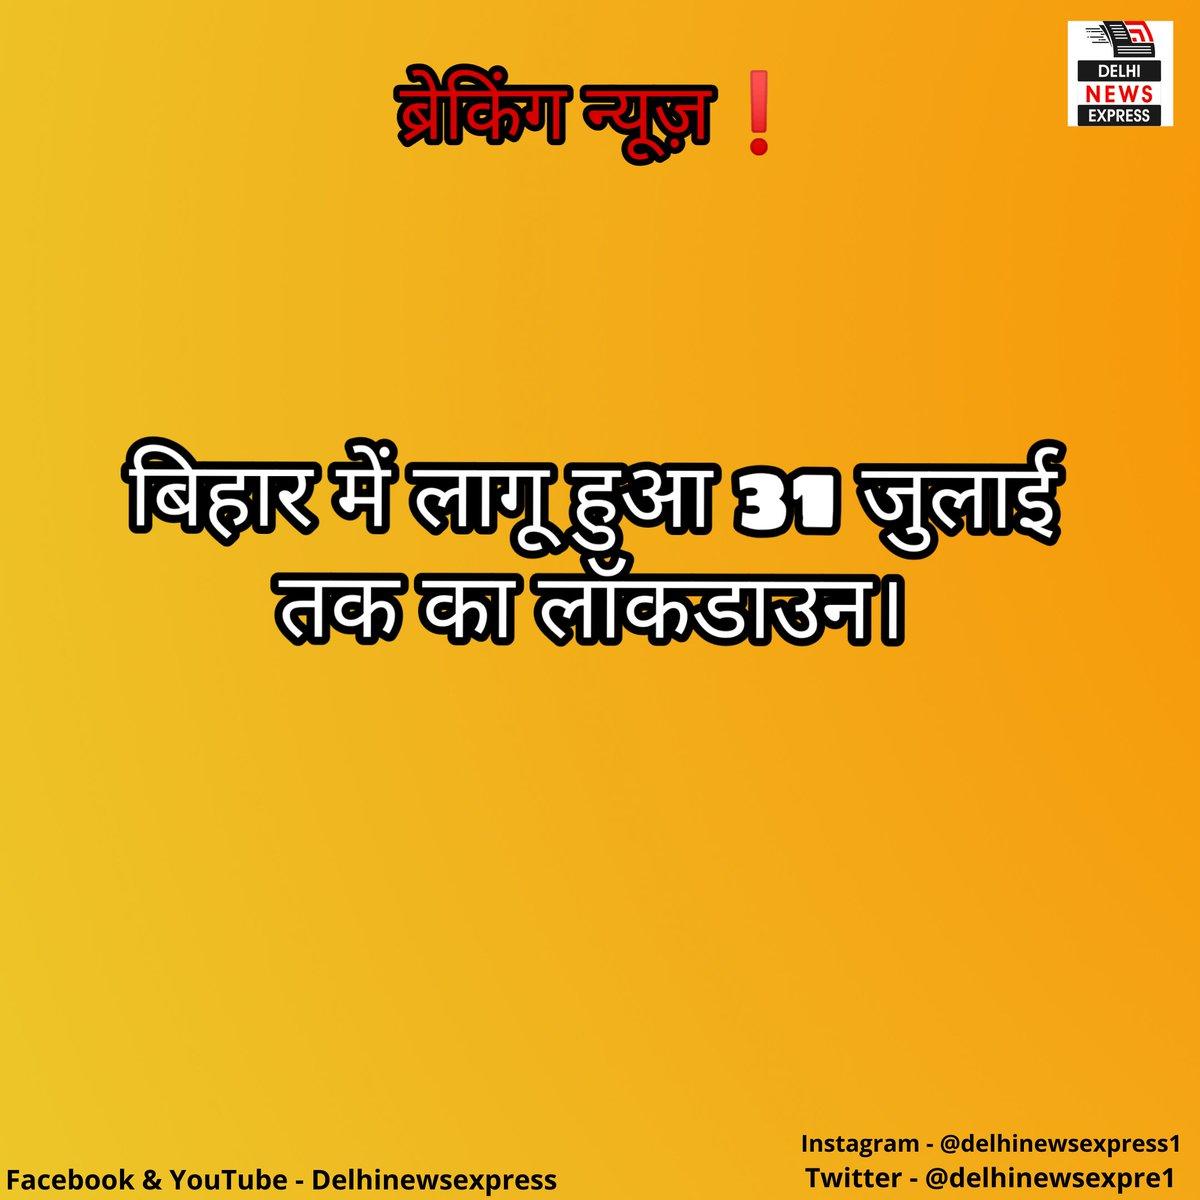 #bihar #india #patna #delhi #bihari #mumbai #instagram #jharkhand #bihartourism #biharsehai #uttarpradesh #photography #love #patnabeats #patnadiaries #rajasthan #bhojpuri #patnalikes #maharashtra #indian #kerala #pawansingh #up #punjab #kolkata #haryana #hai #follow https://t.co/XaiNtFimuk